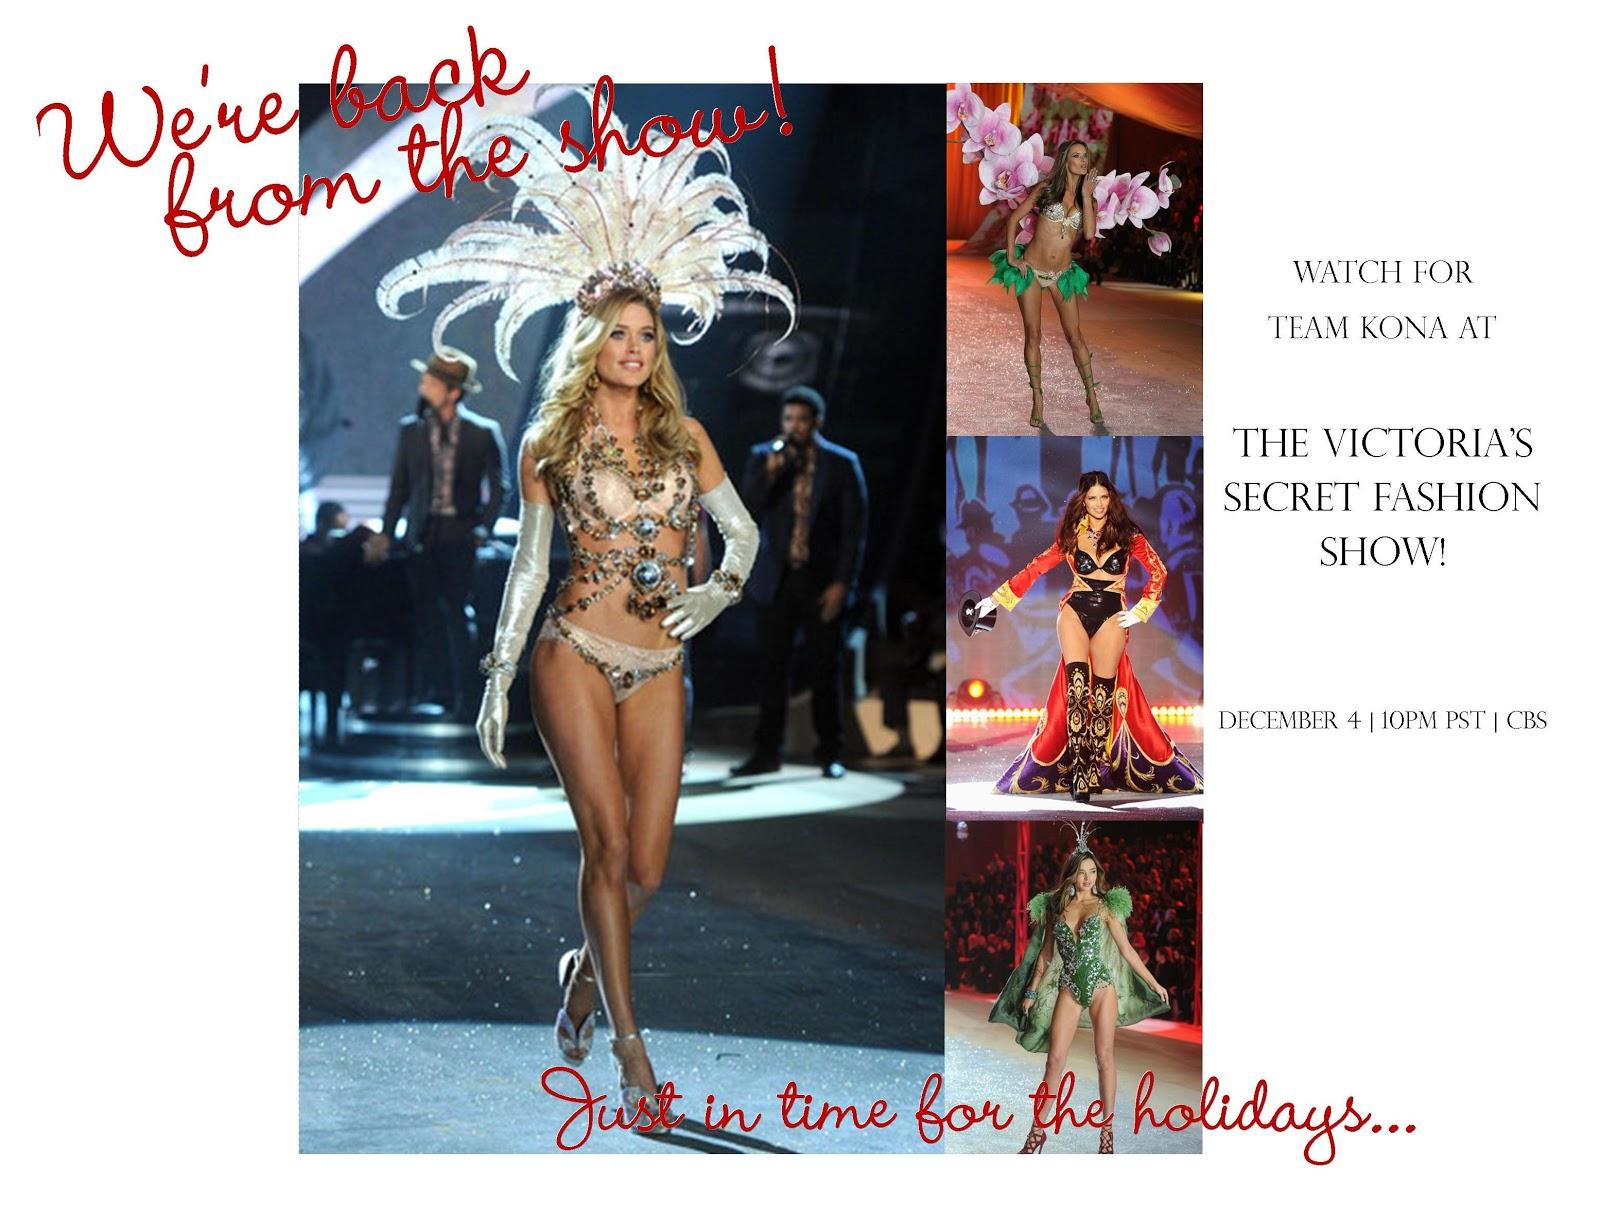 http://4.bp.blogspot.com/-_kxGmL0ZEto/ULUFn6eUrLI/AAAAAAAACz0/dr9x4iMKoVQ/s1600/kona-tanning-2012-victorias-secret-fashion-show-alessandra-adriana-miranda-doutzen-katie-kenny-best.jpg